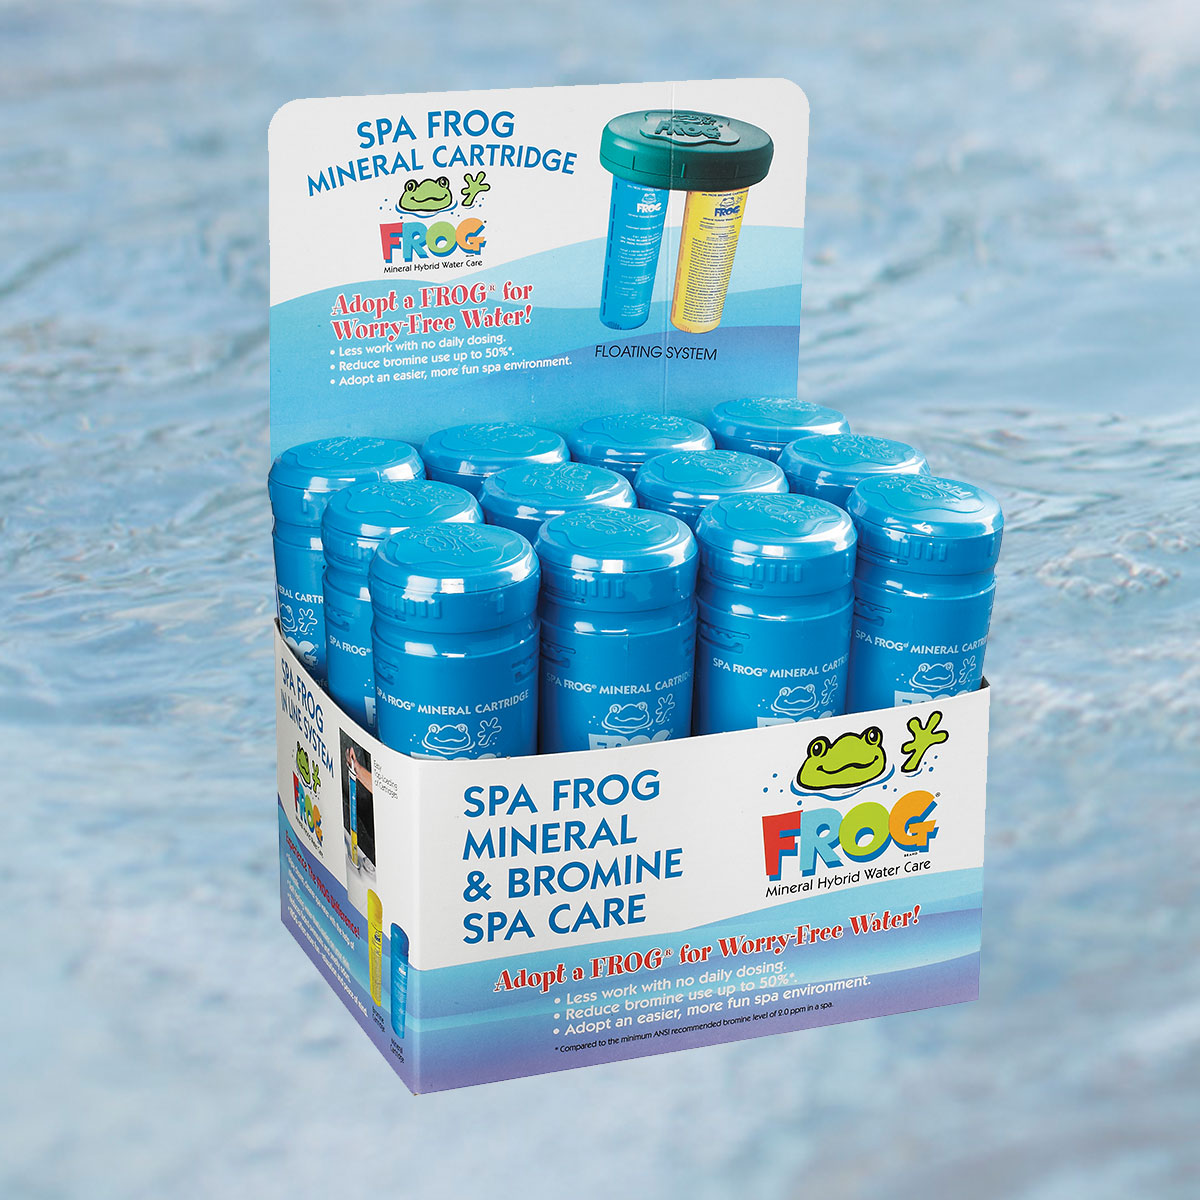 spa frog water care caldera